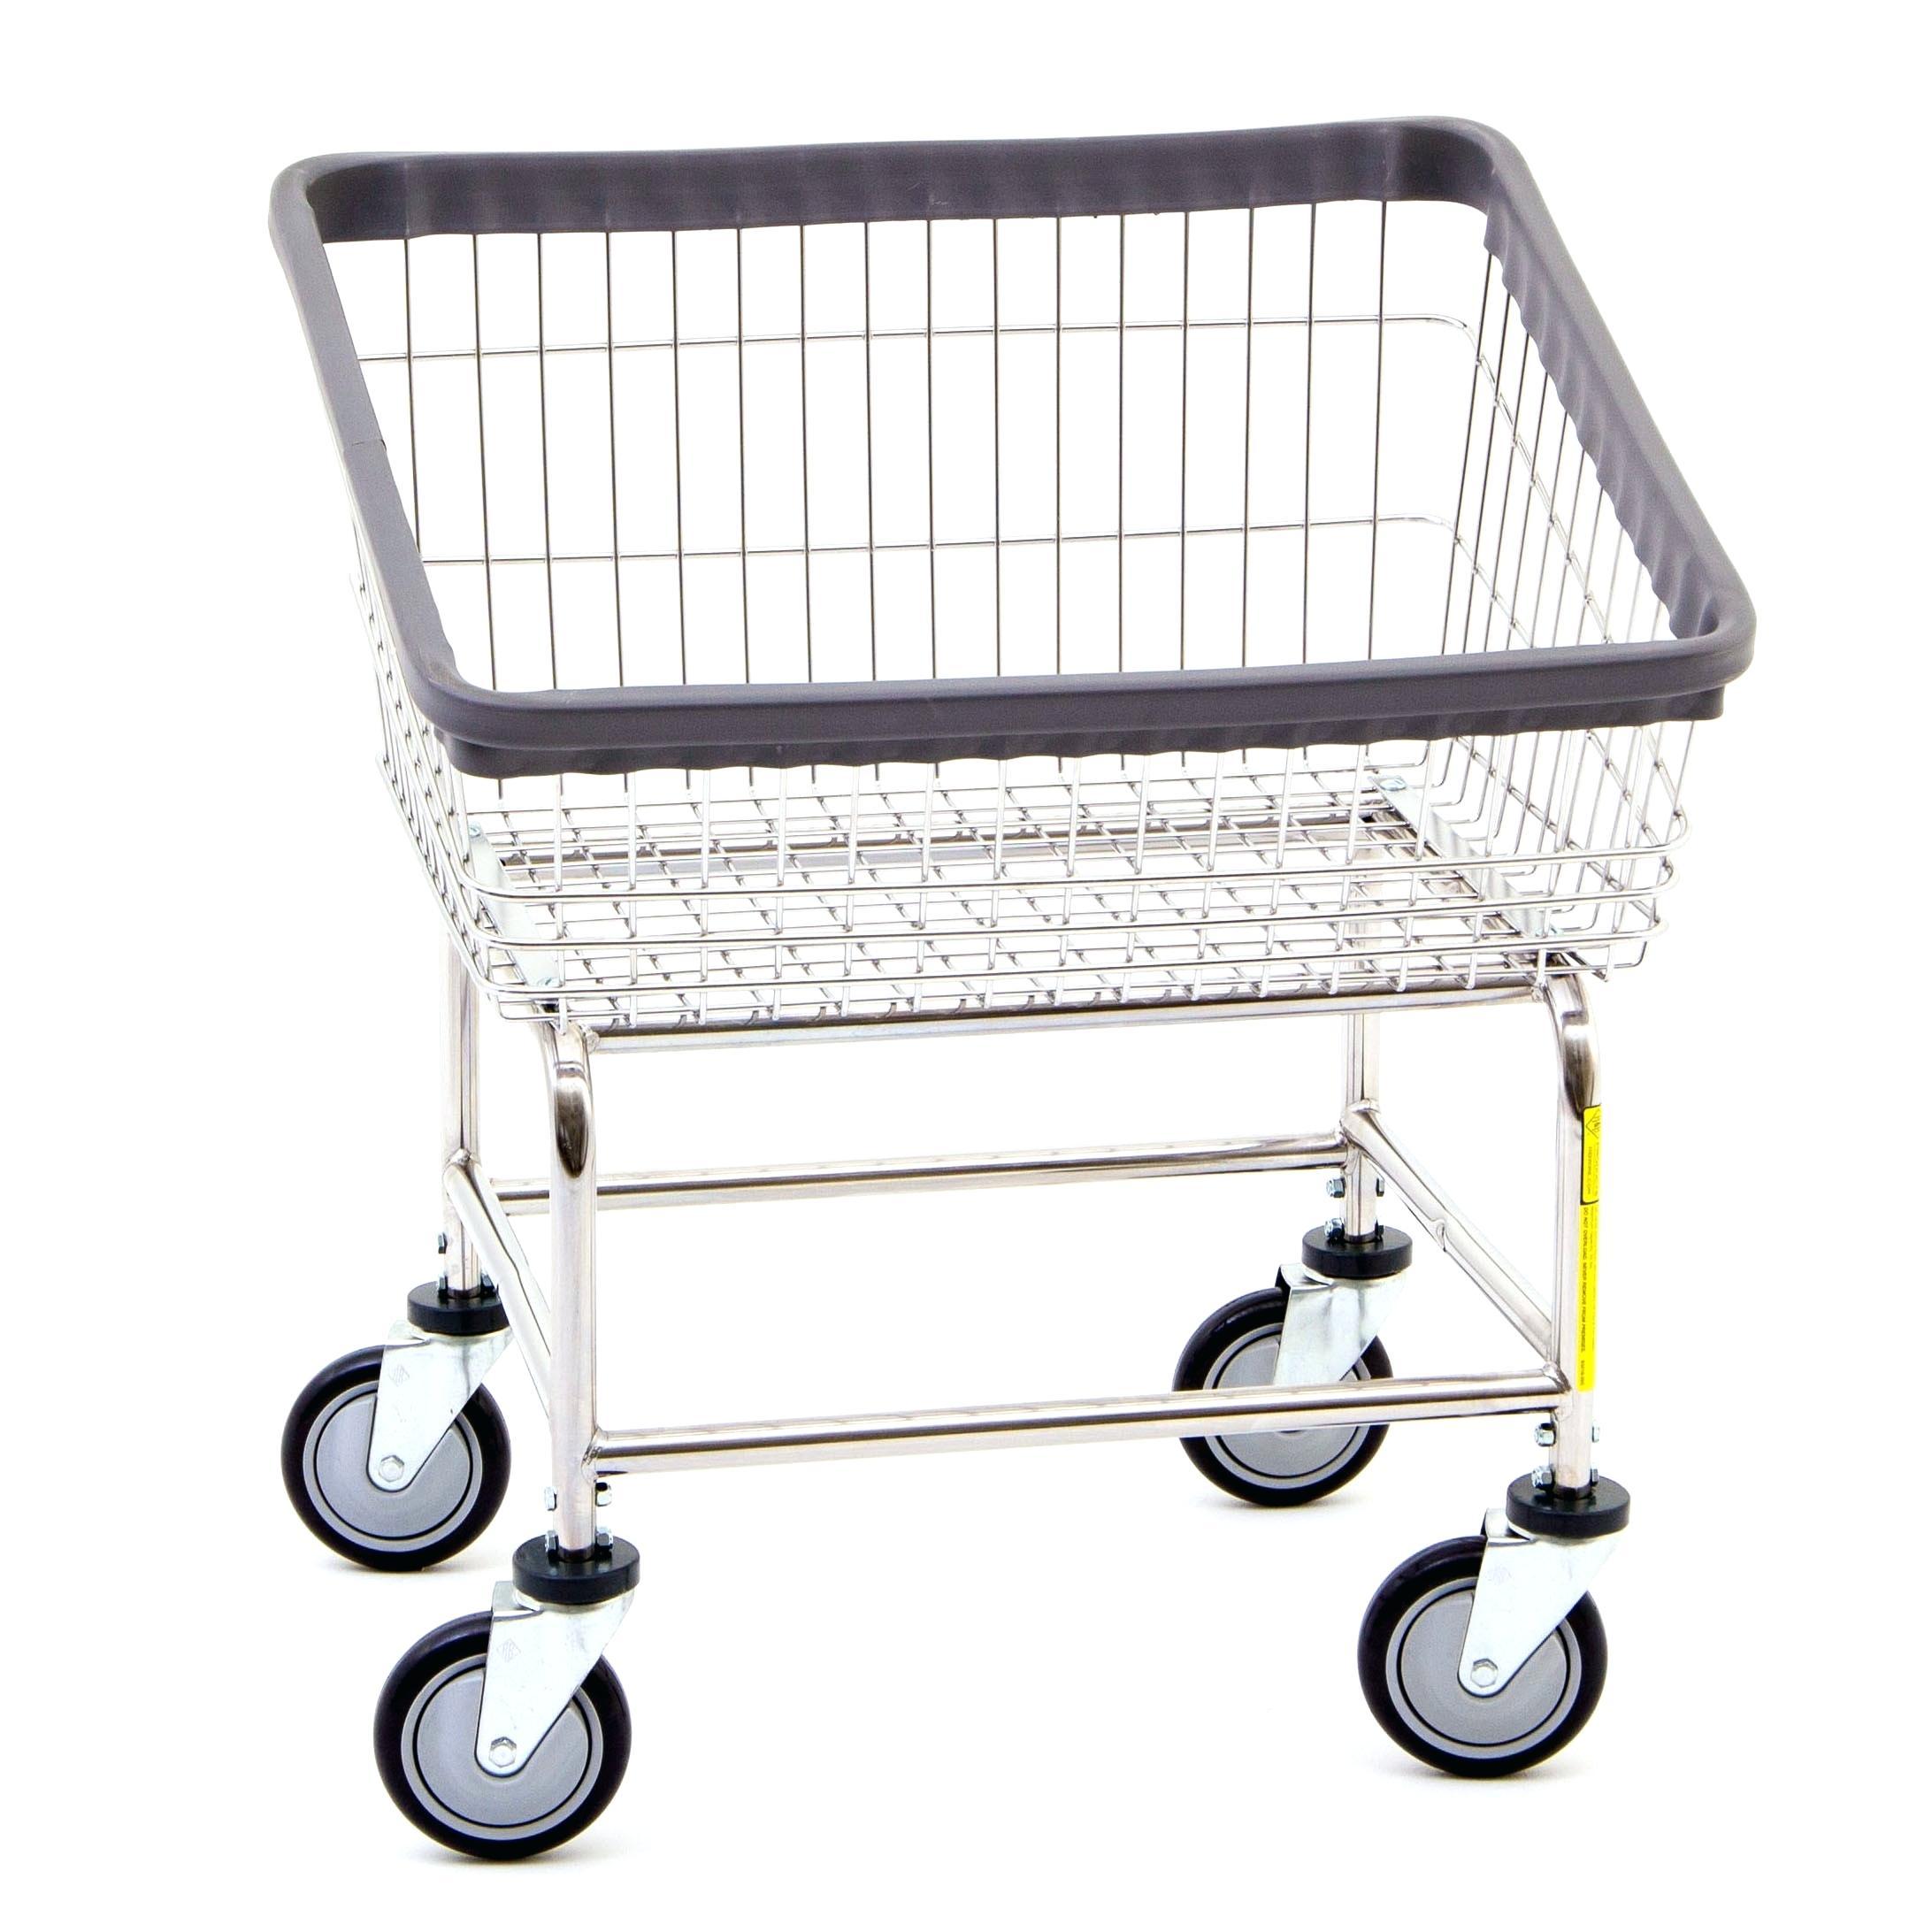 2184x2184 Rolling Laundry Basket Cart Cartoon Images Hamper